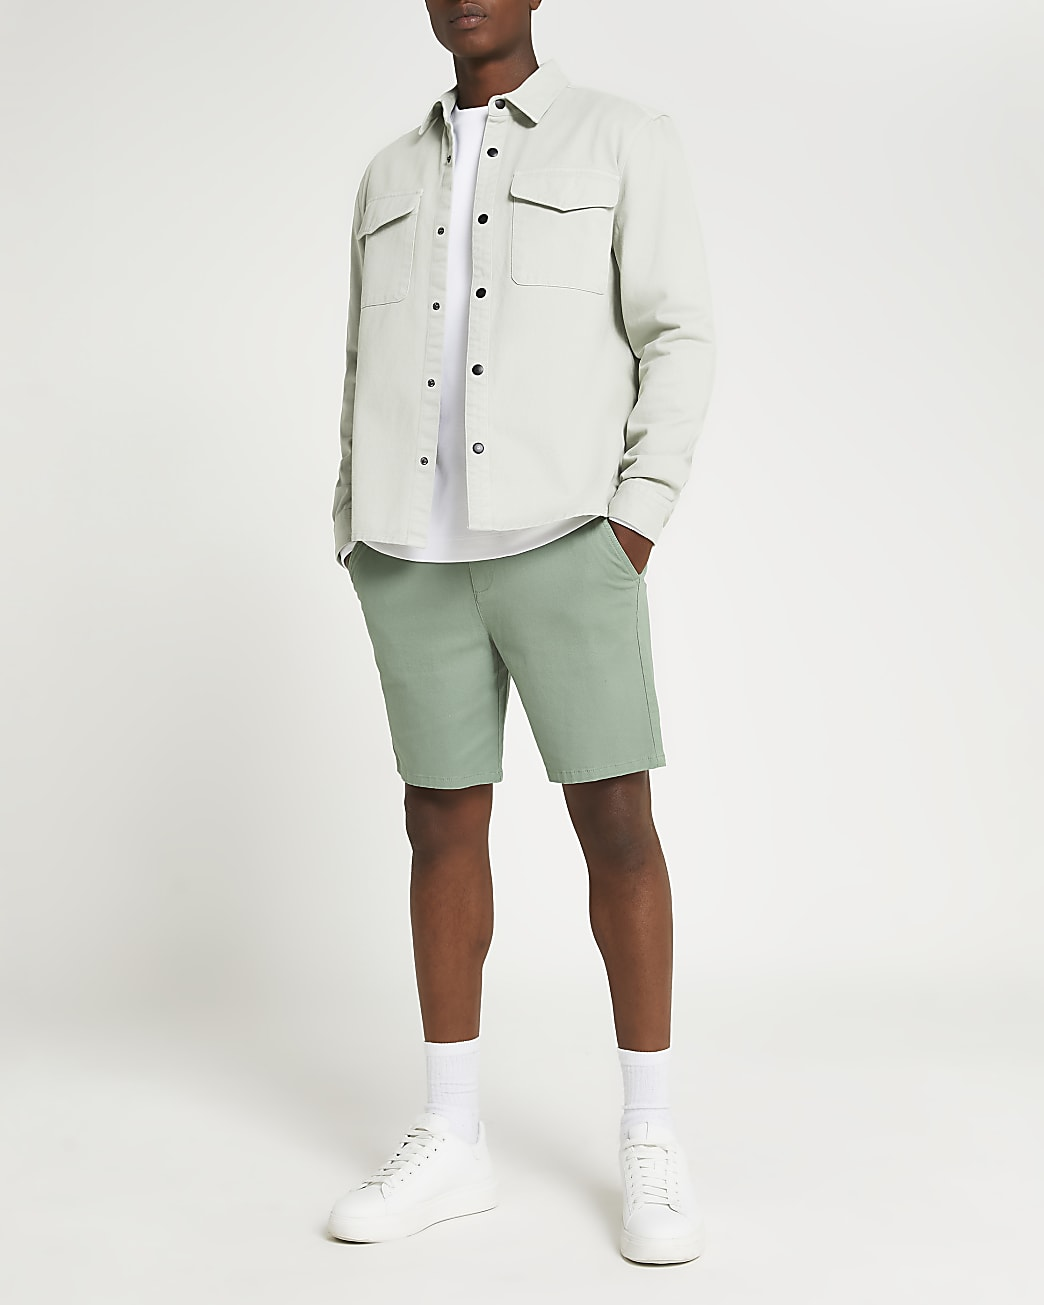 Green slim fit chino shorts